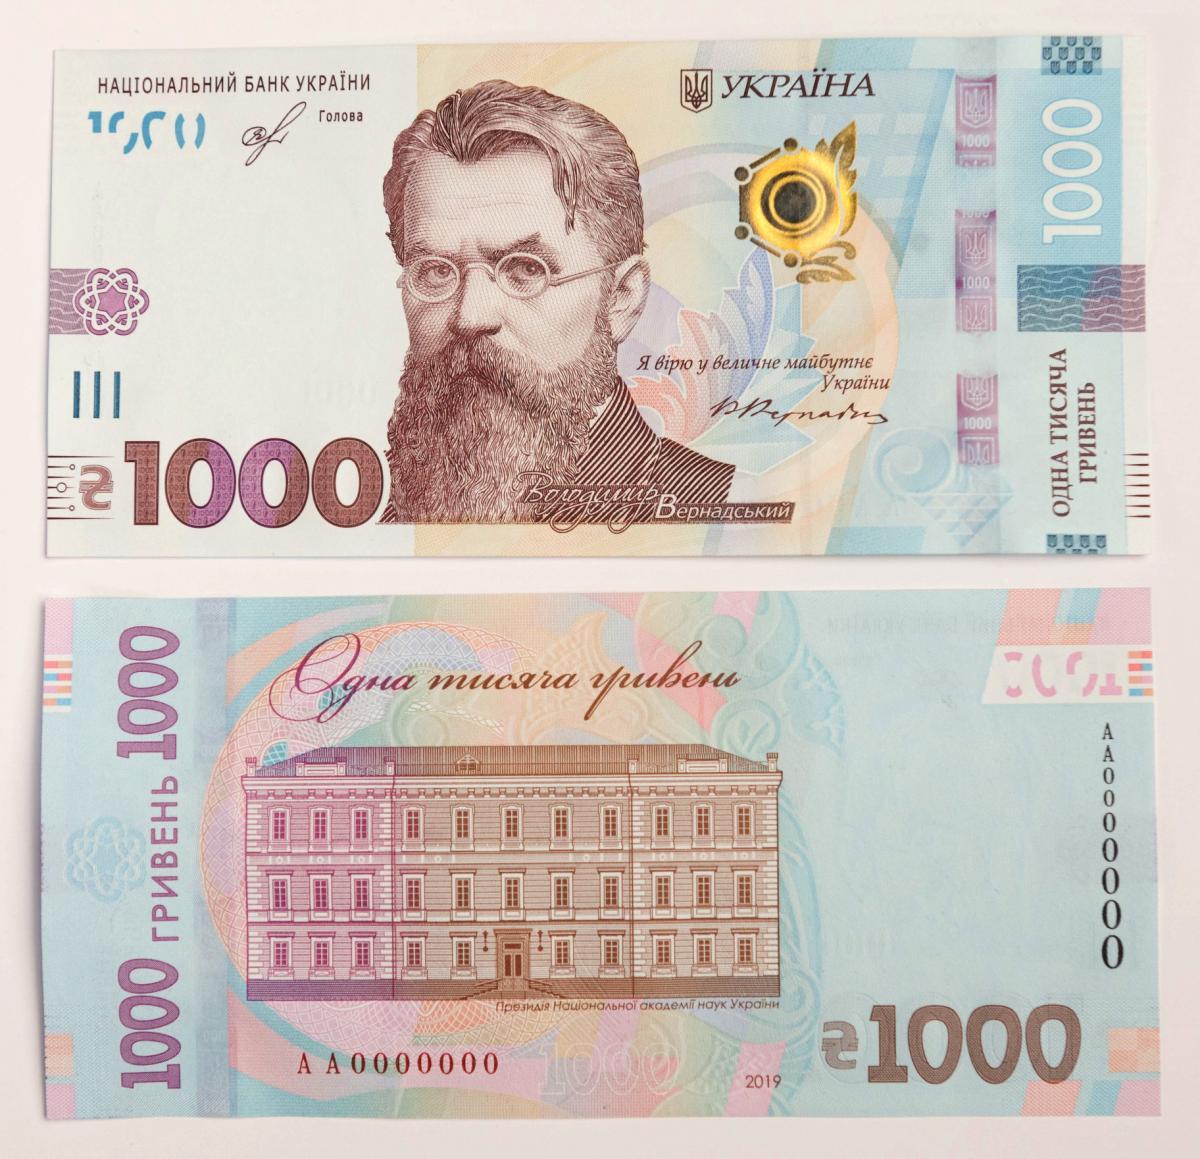 тысяча гривен_новая купюра_1000 грн